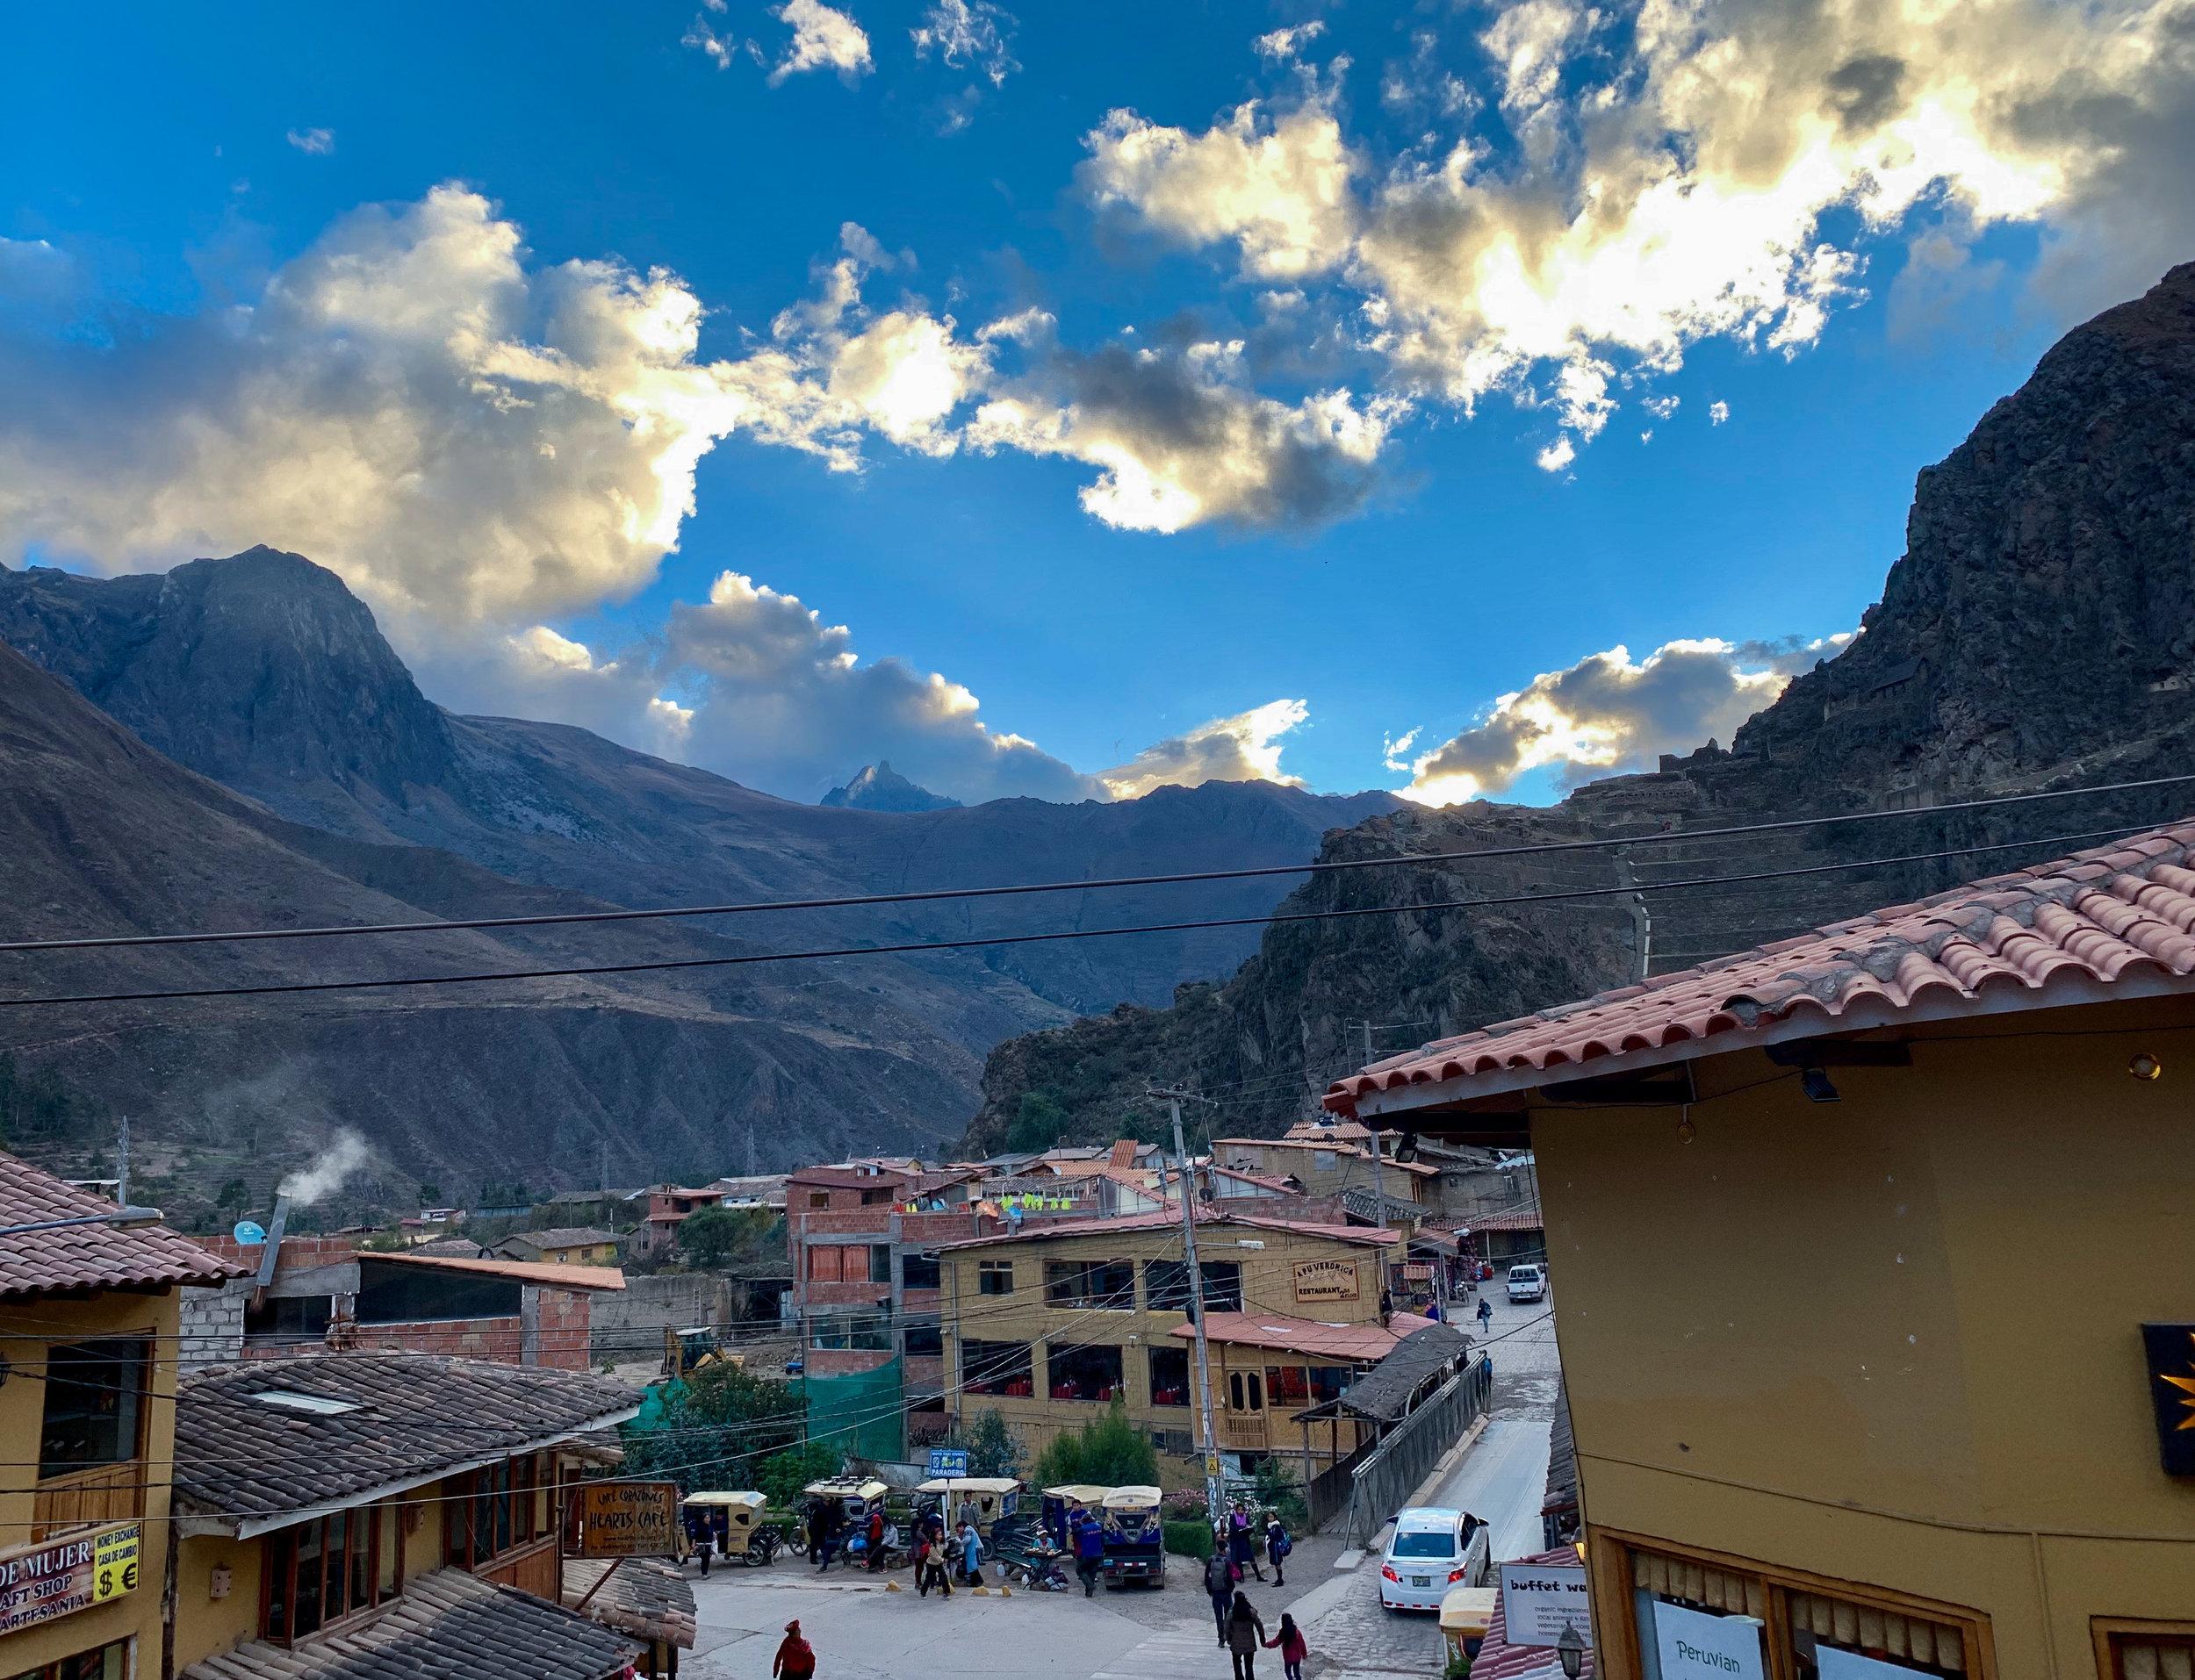 Happy Hour in the Andes - Ollantaytambo, Cusco Region